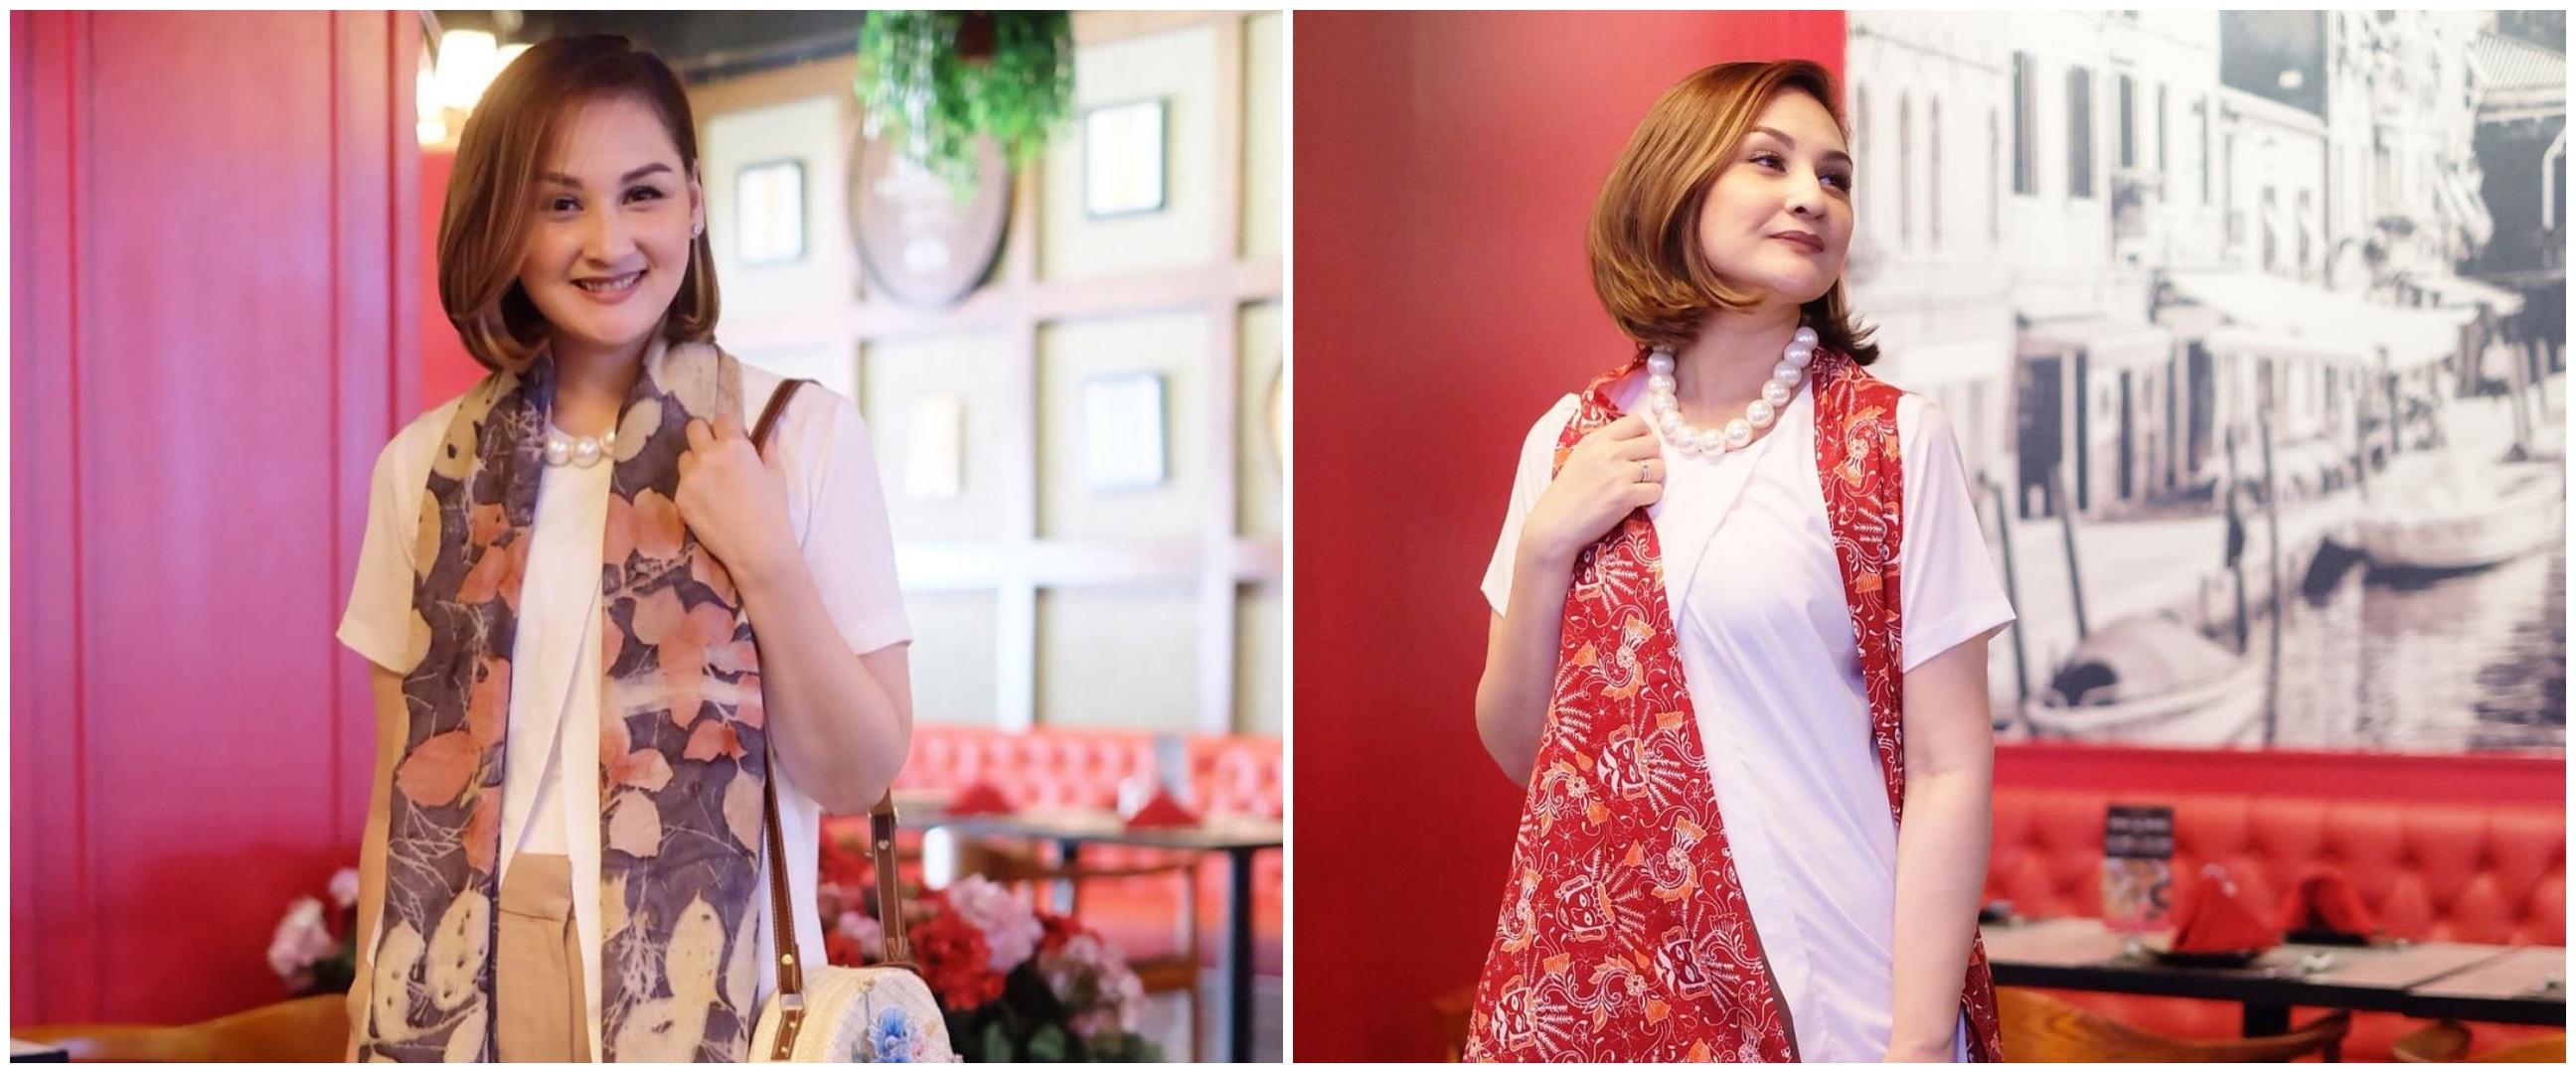 7 Potret jadul Mona Ratuliu saat remaja, pose dan dandannya khas